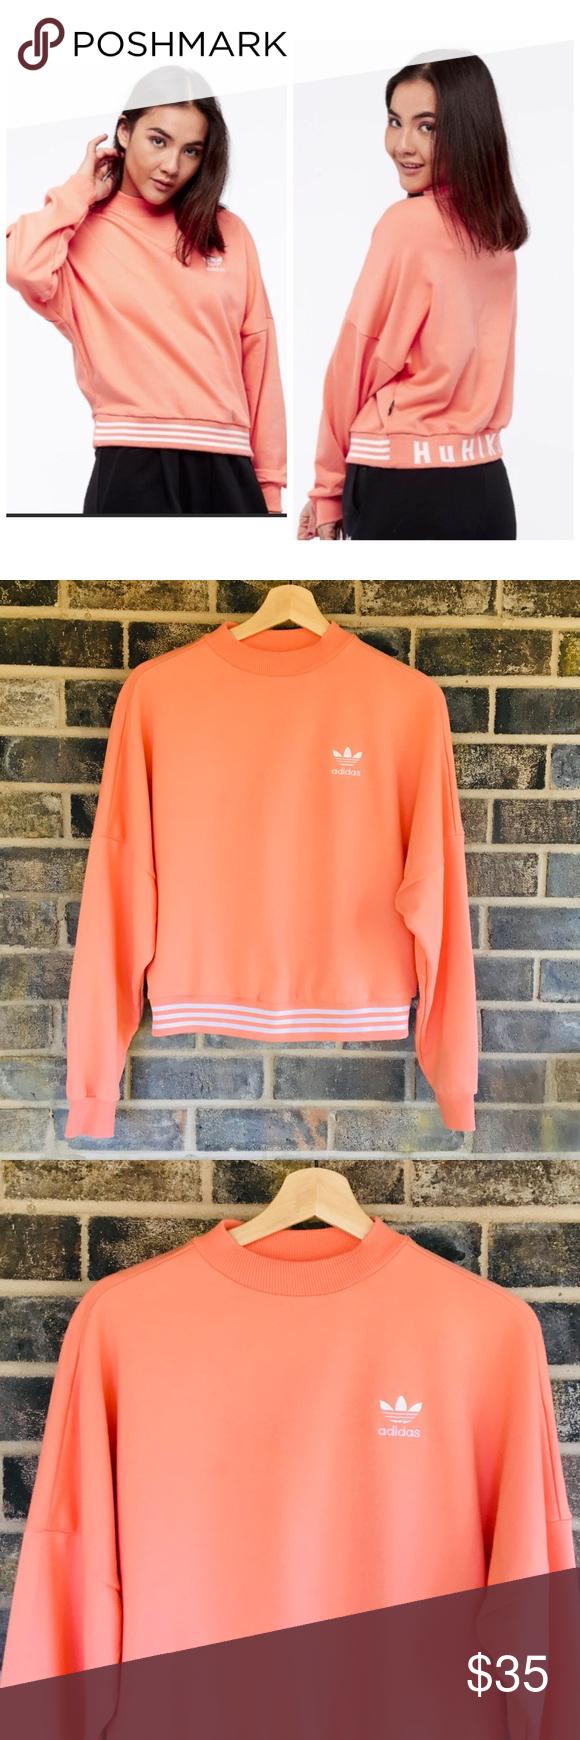 Adidas Pharrell Williams Hu Hiking Sweatshirt Xs Sweatshirts Adidas Pharrell Williams Pharrell Williams [ 1740 x 580 Pixel ]